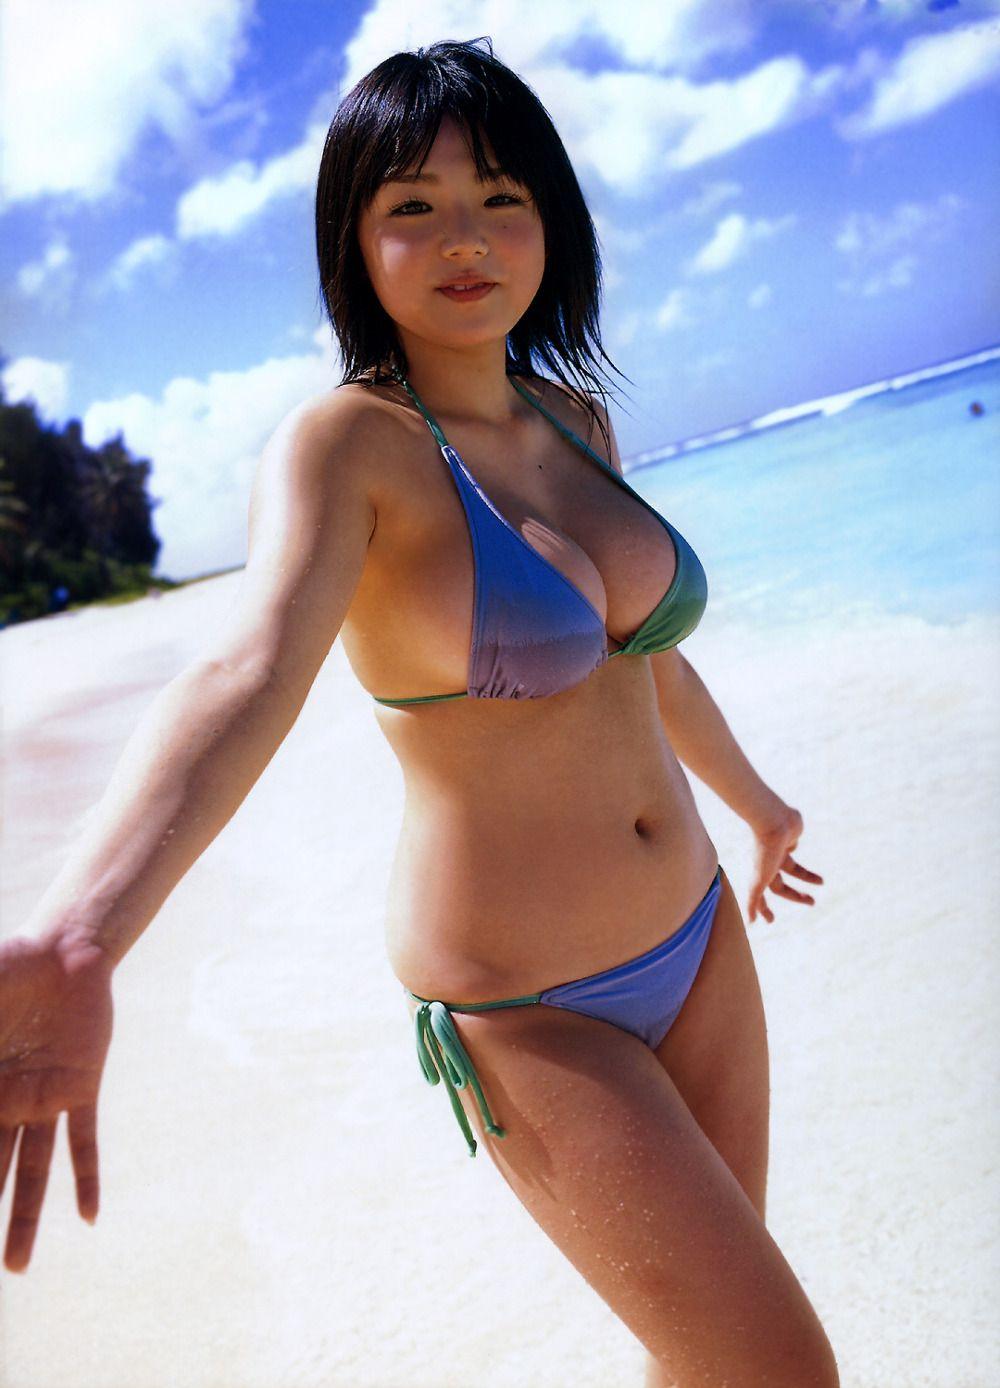 Ai Shinozaki (시노자키 아이,篠崎愛 ,しのざきあい) Fan Blog :: [2008.05] [PB] Ai Shinozaki - Milk Colored Love(篠崎愛 みるく色の愛)